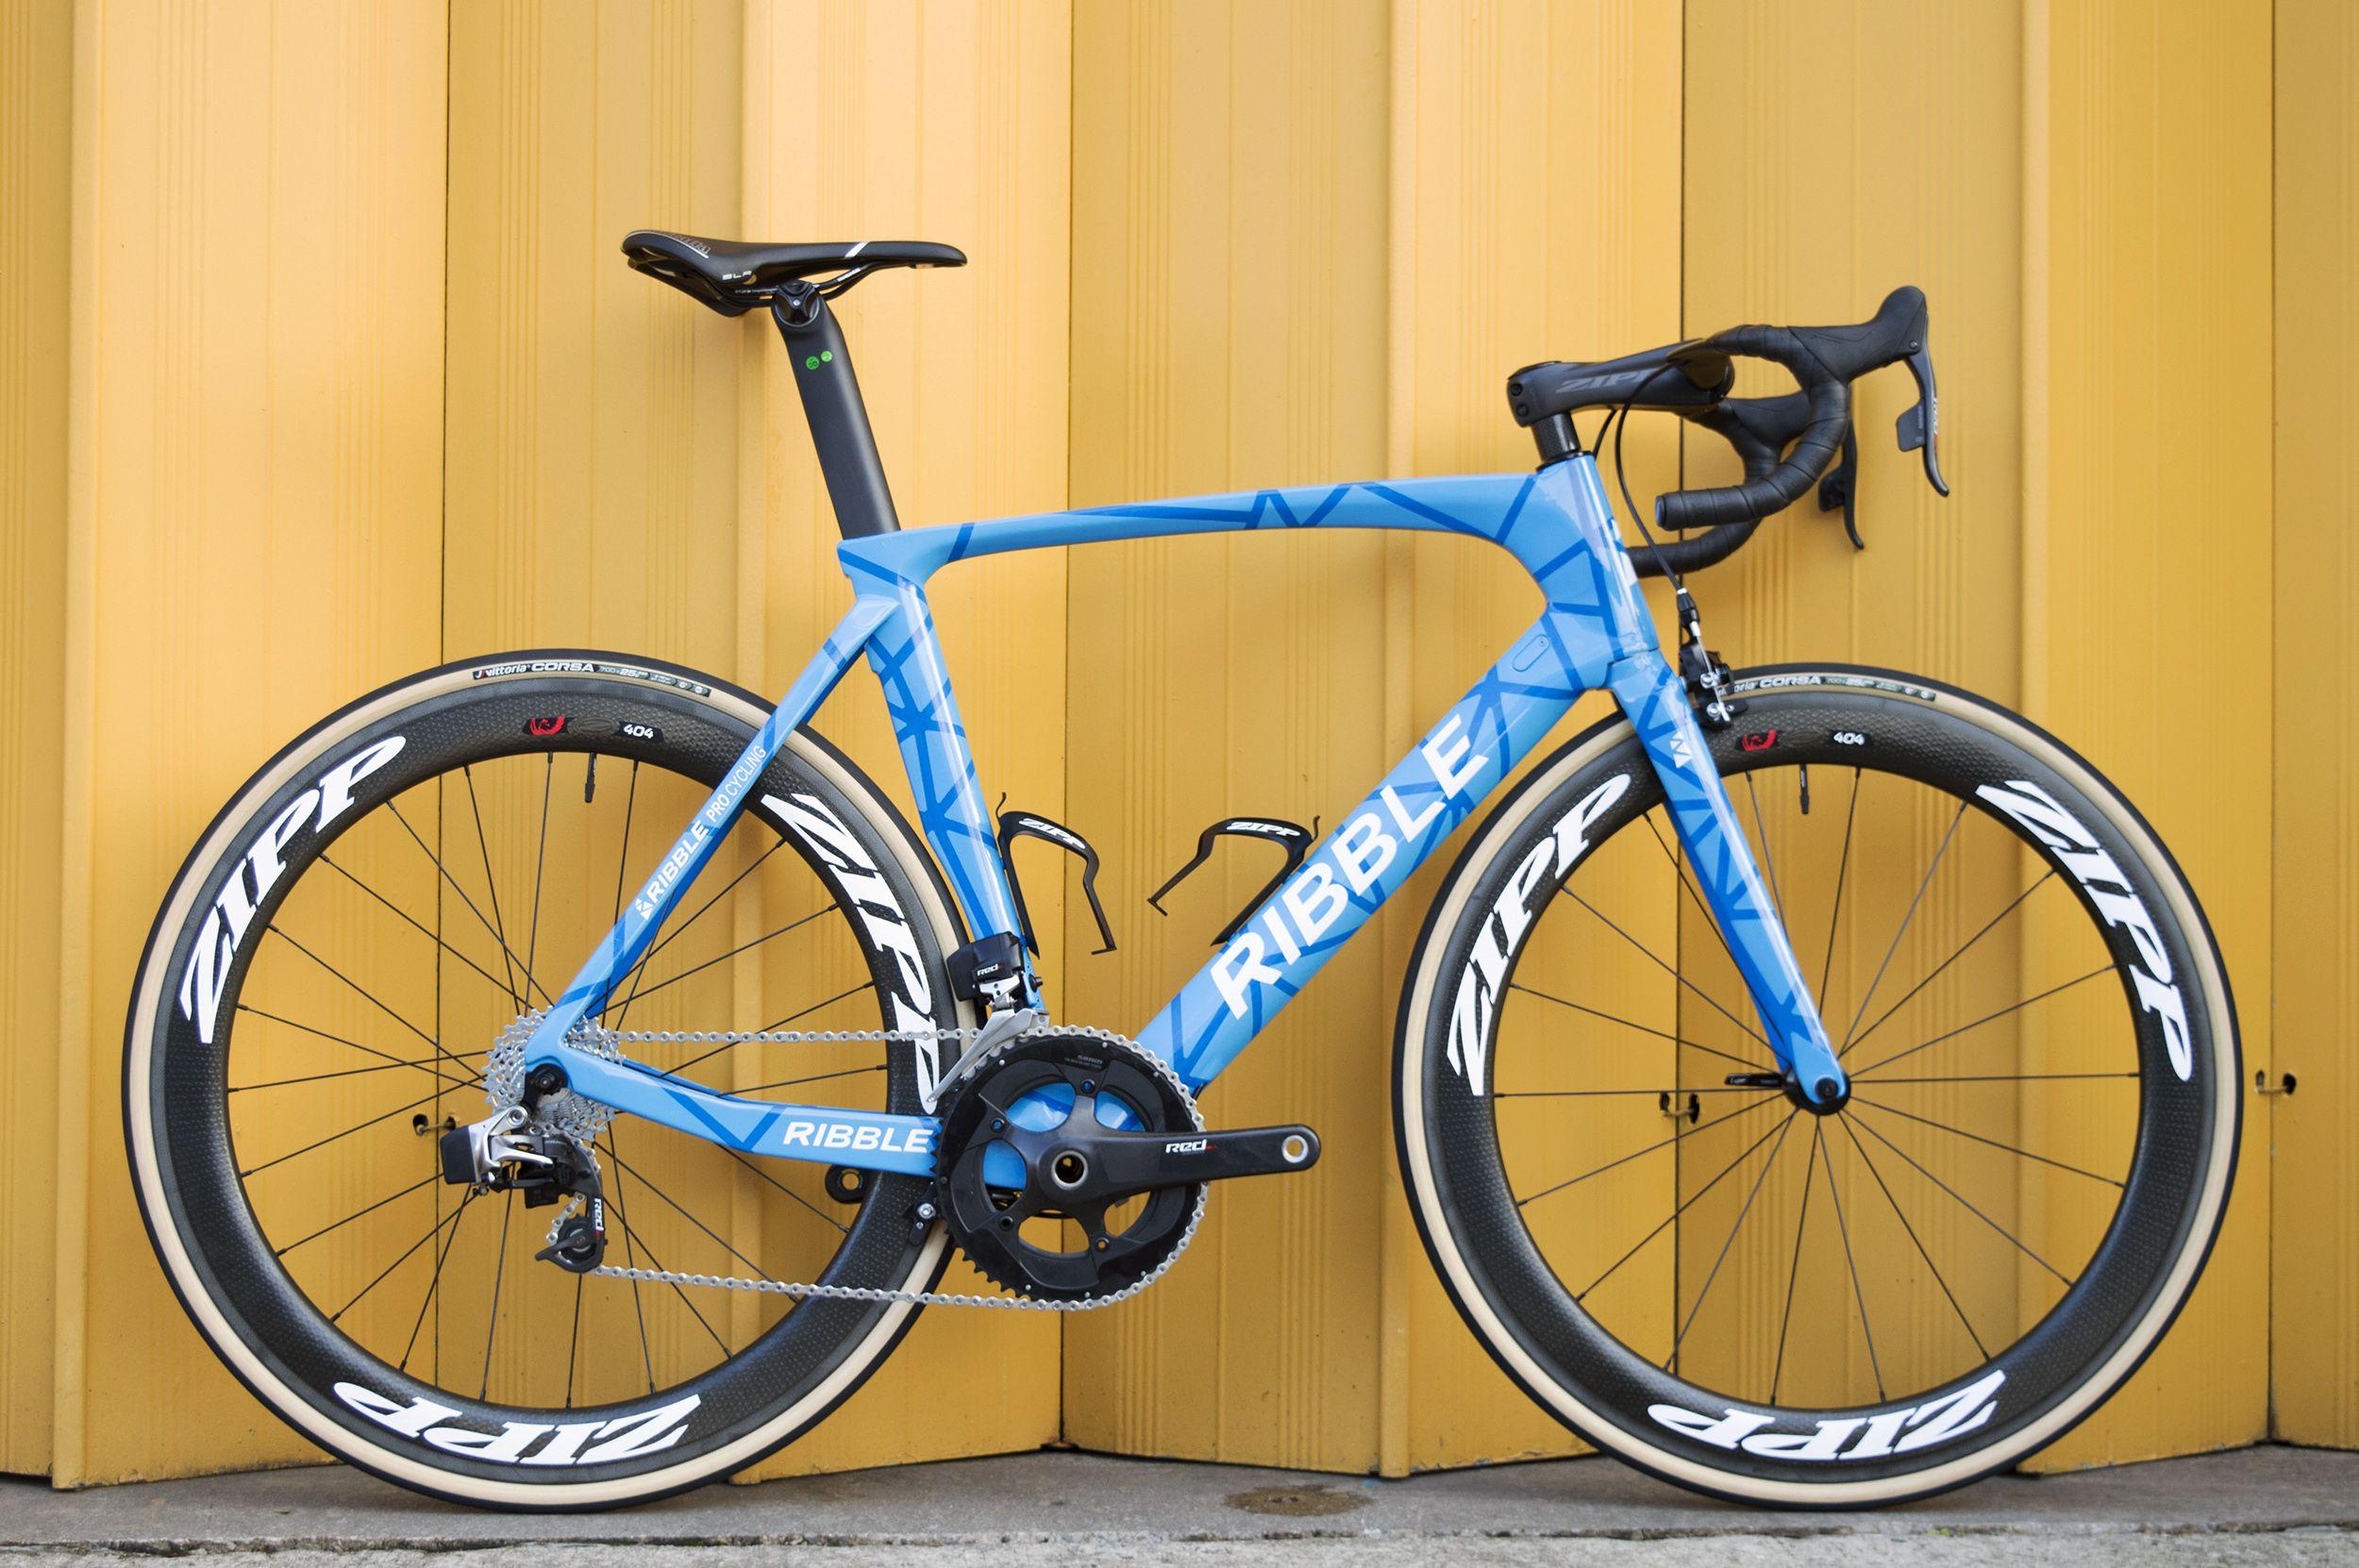 Ribble Launches New Aero 833 Bike In Custom Paint Job Bicycle